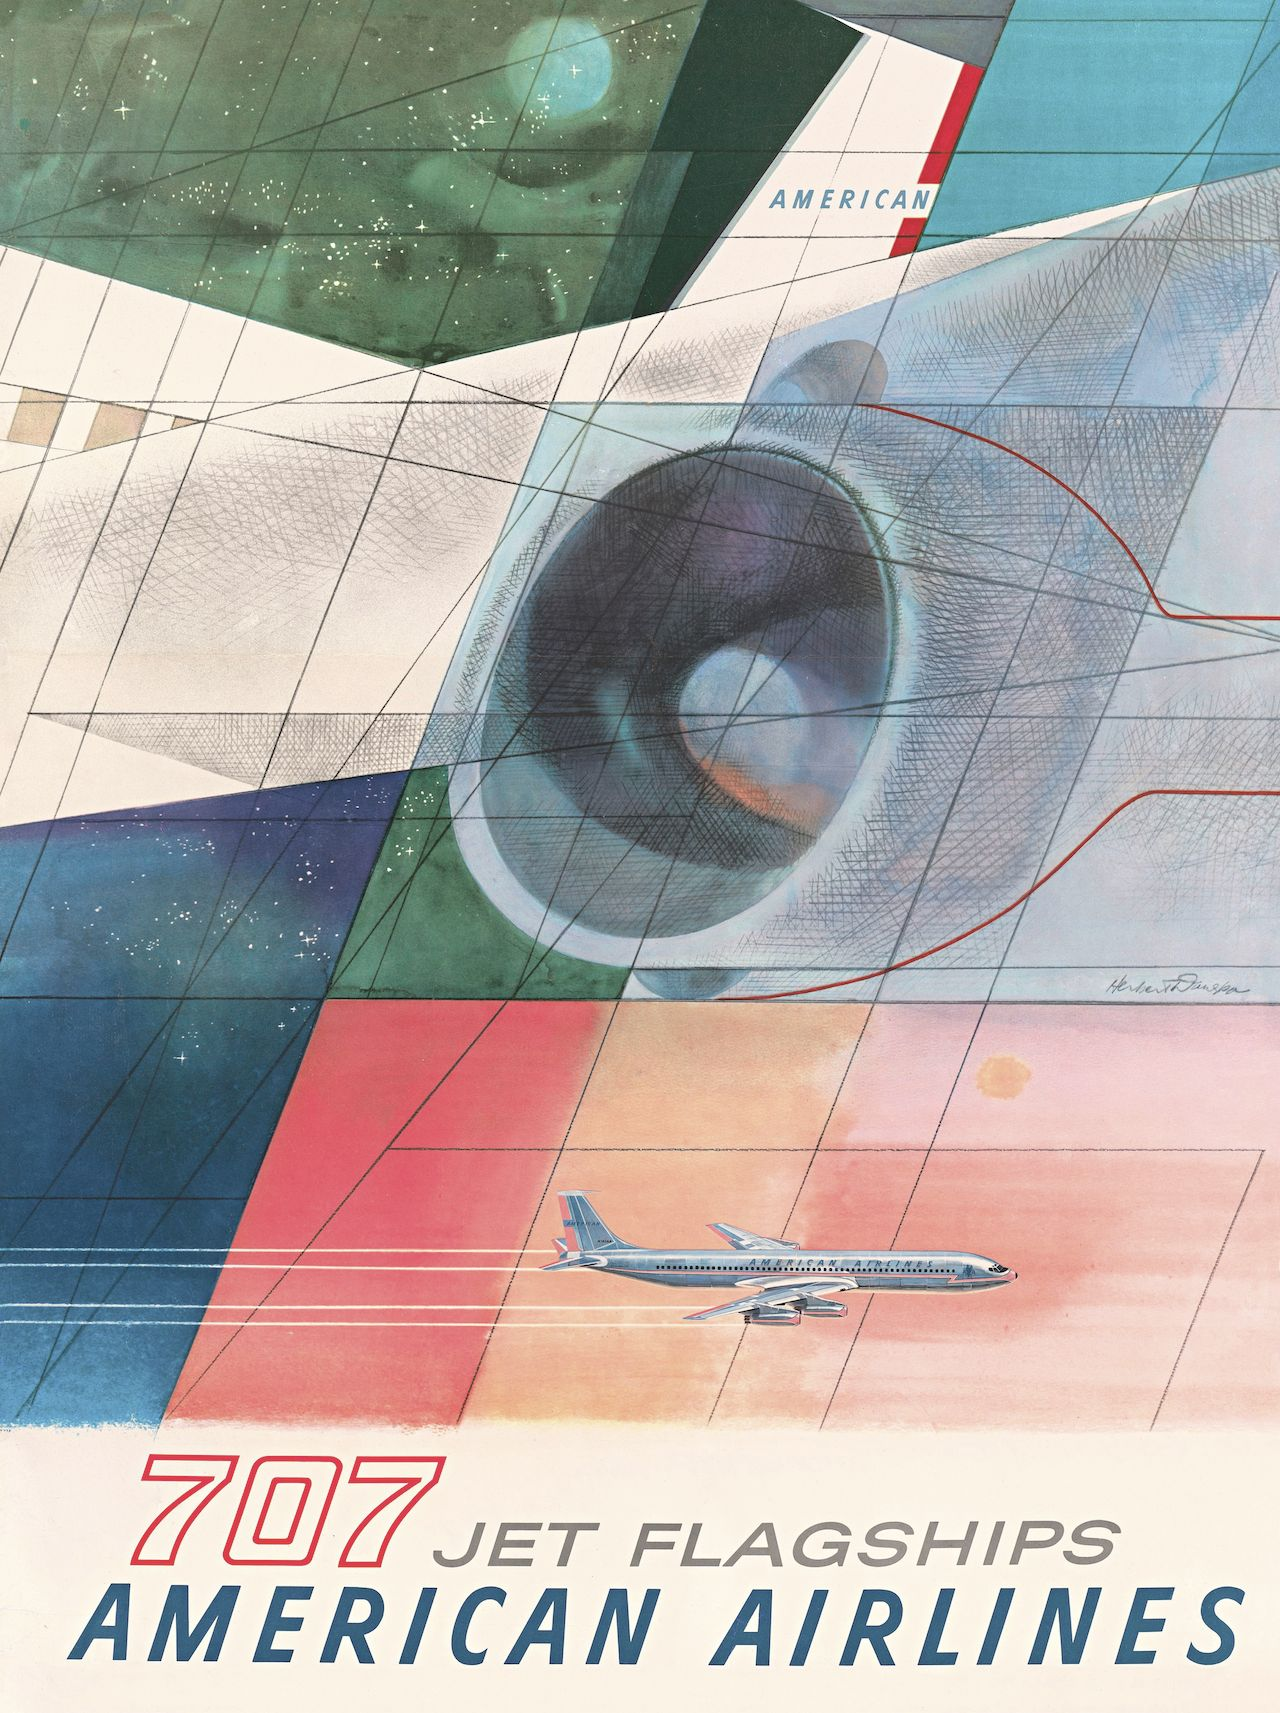 Airline Visual Identity 1945 - 1975